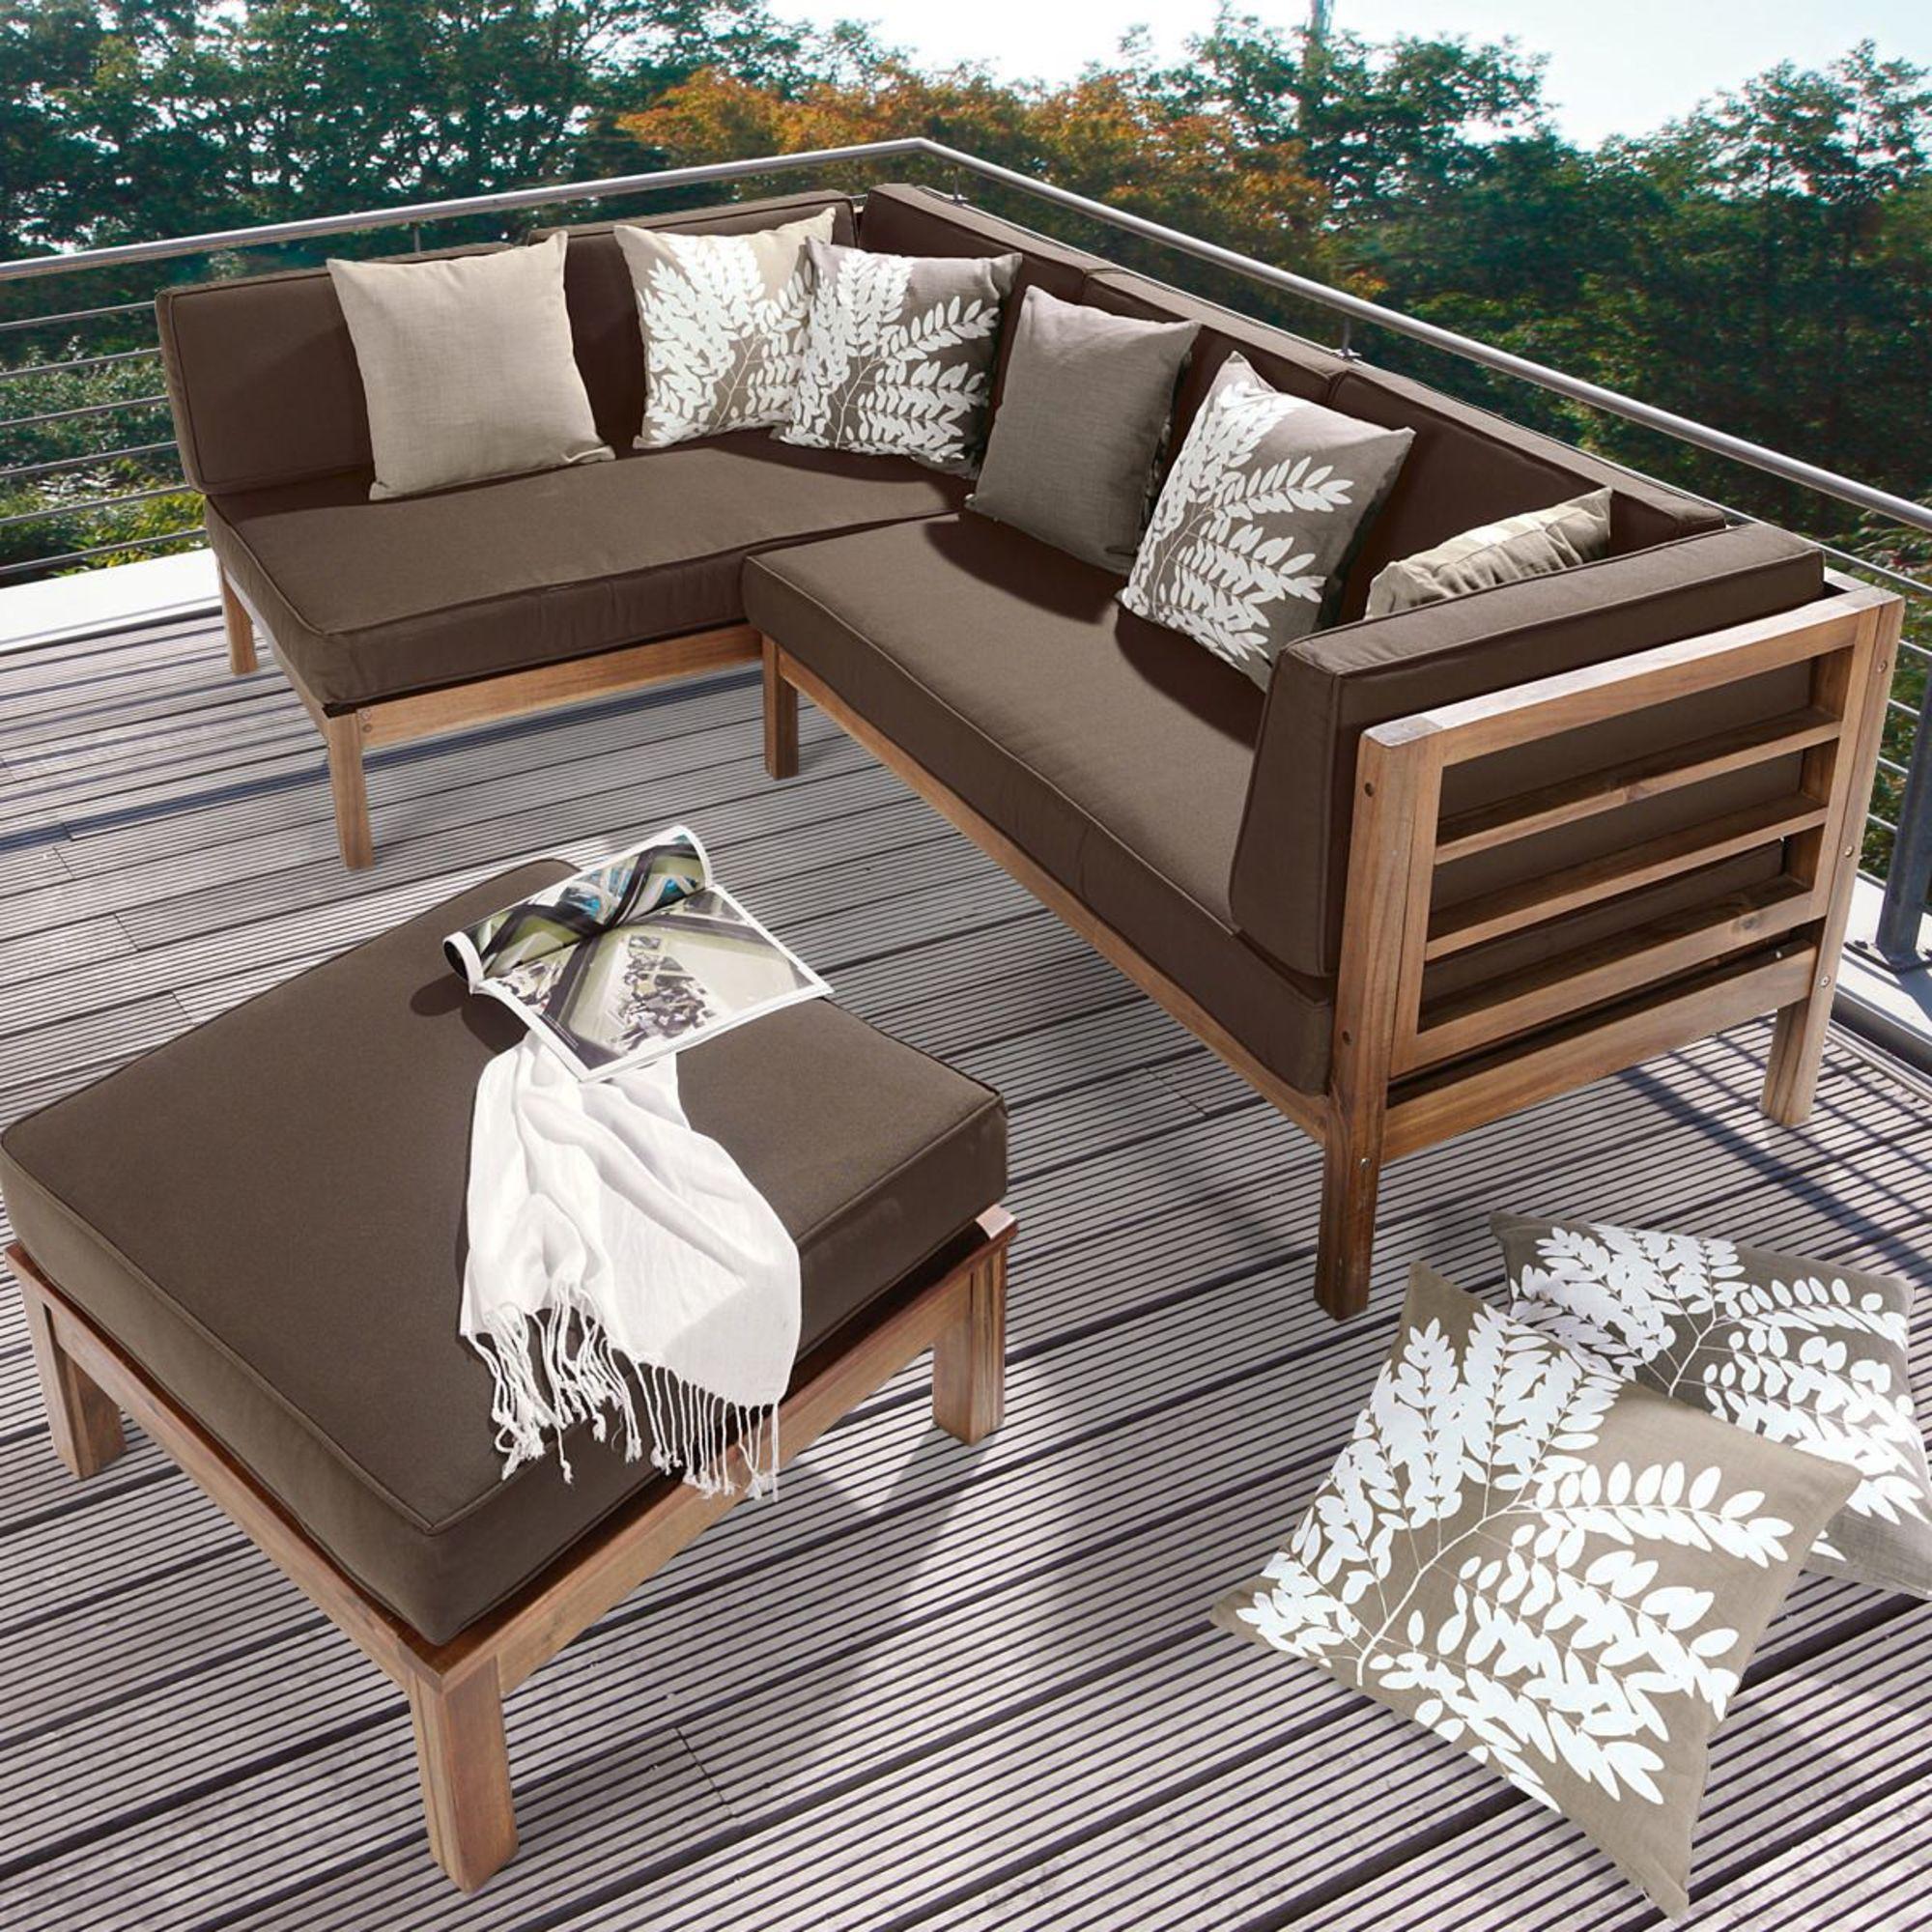 Gartenmöbel holz lounge  Ecklounge, 3-tlg. Natur, inkl. Auflagen